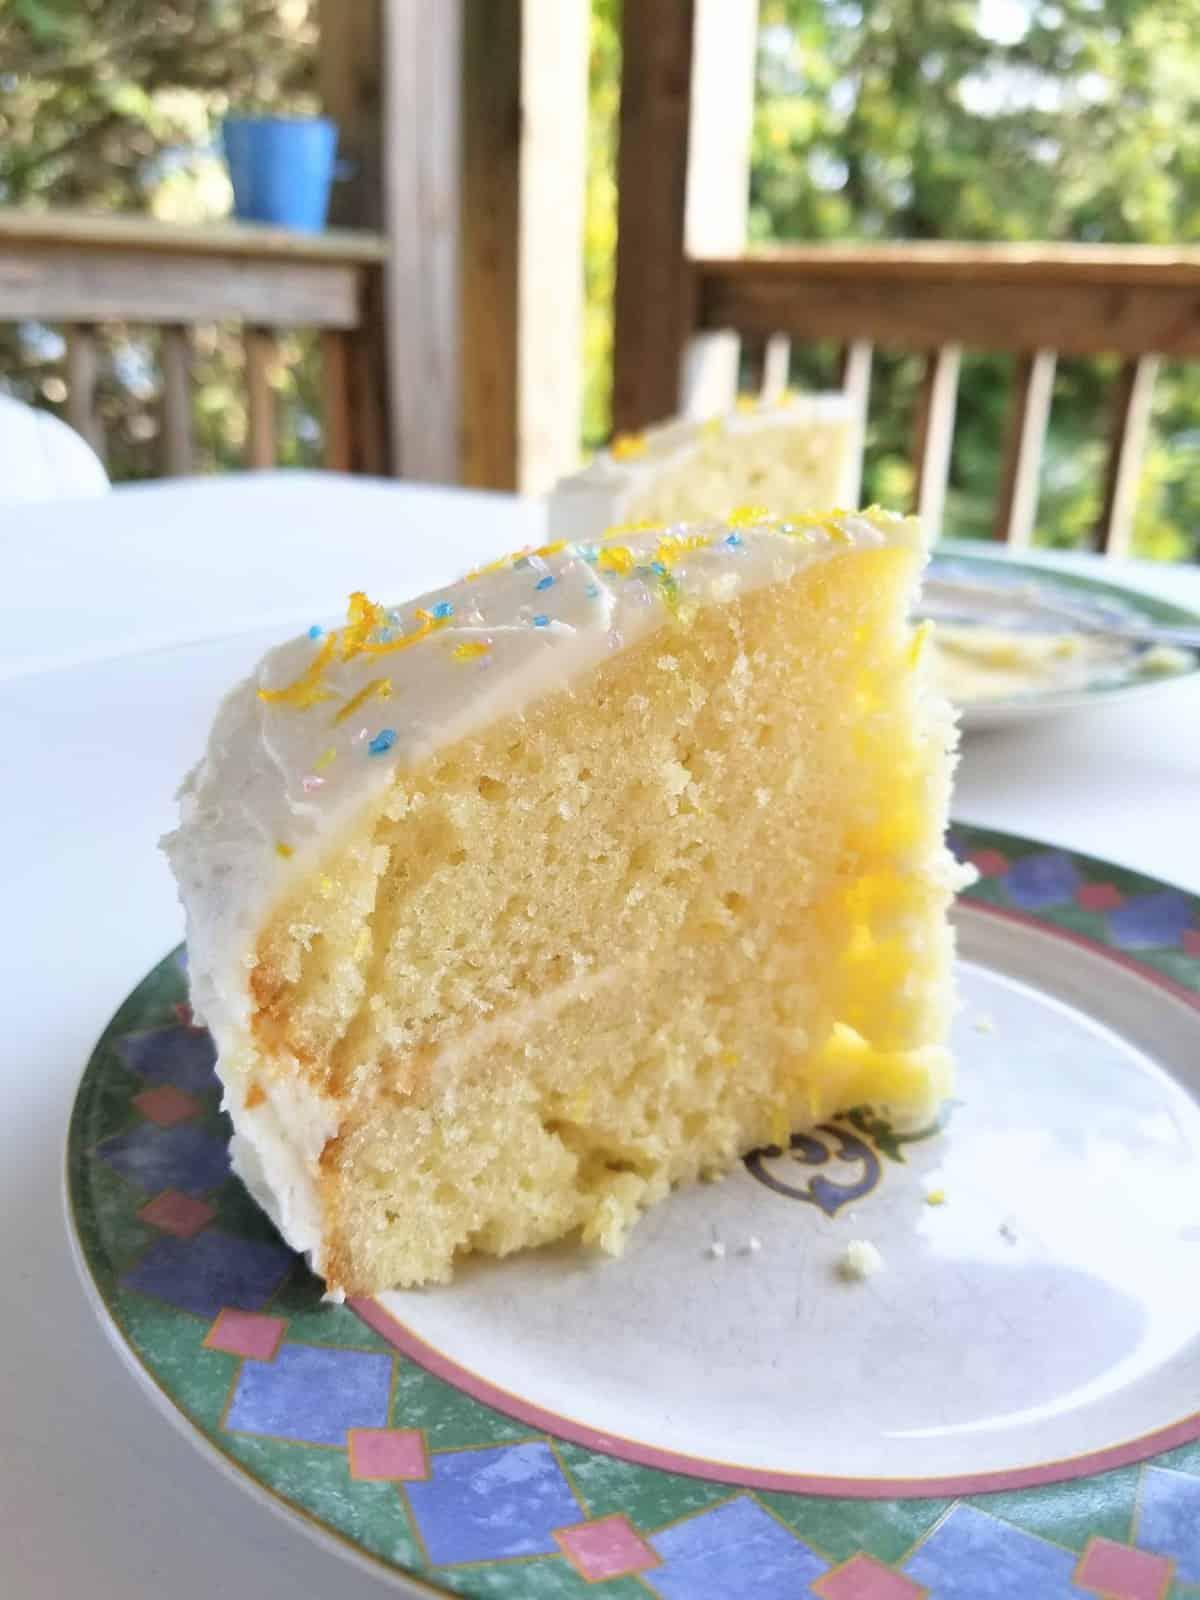 Lemon Cake with Zesty Buttercream Frosting